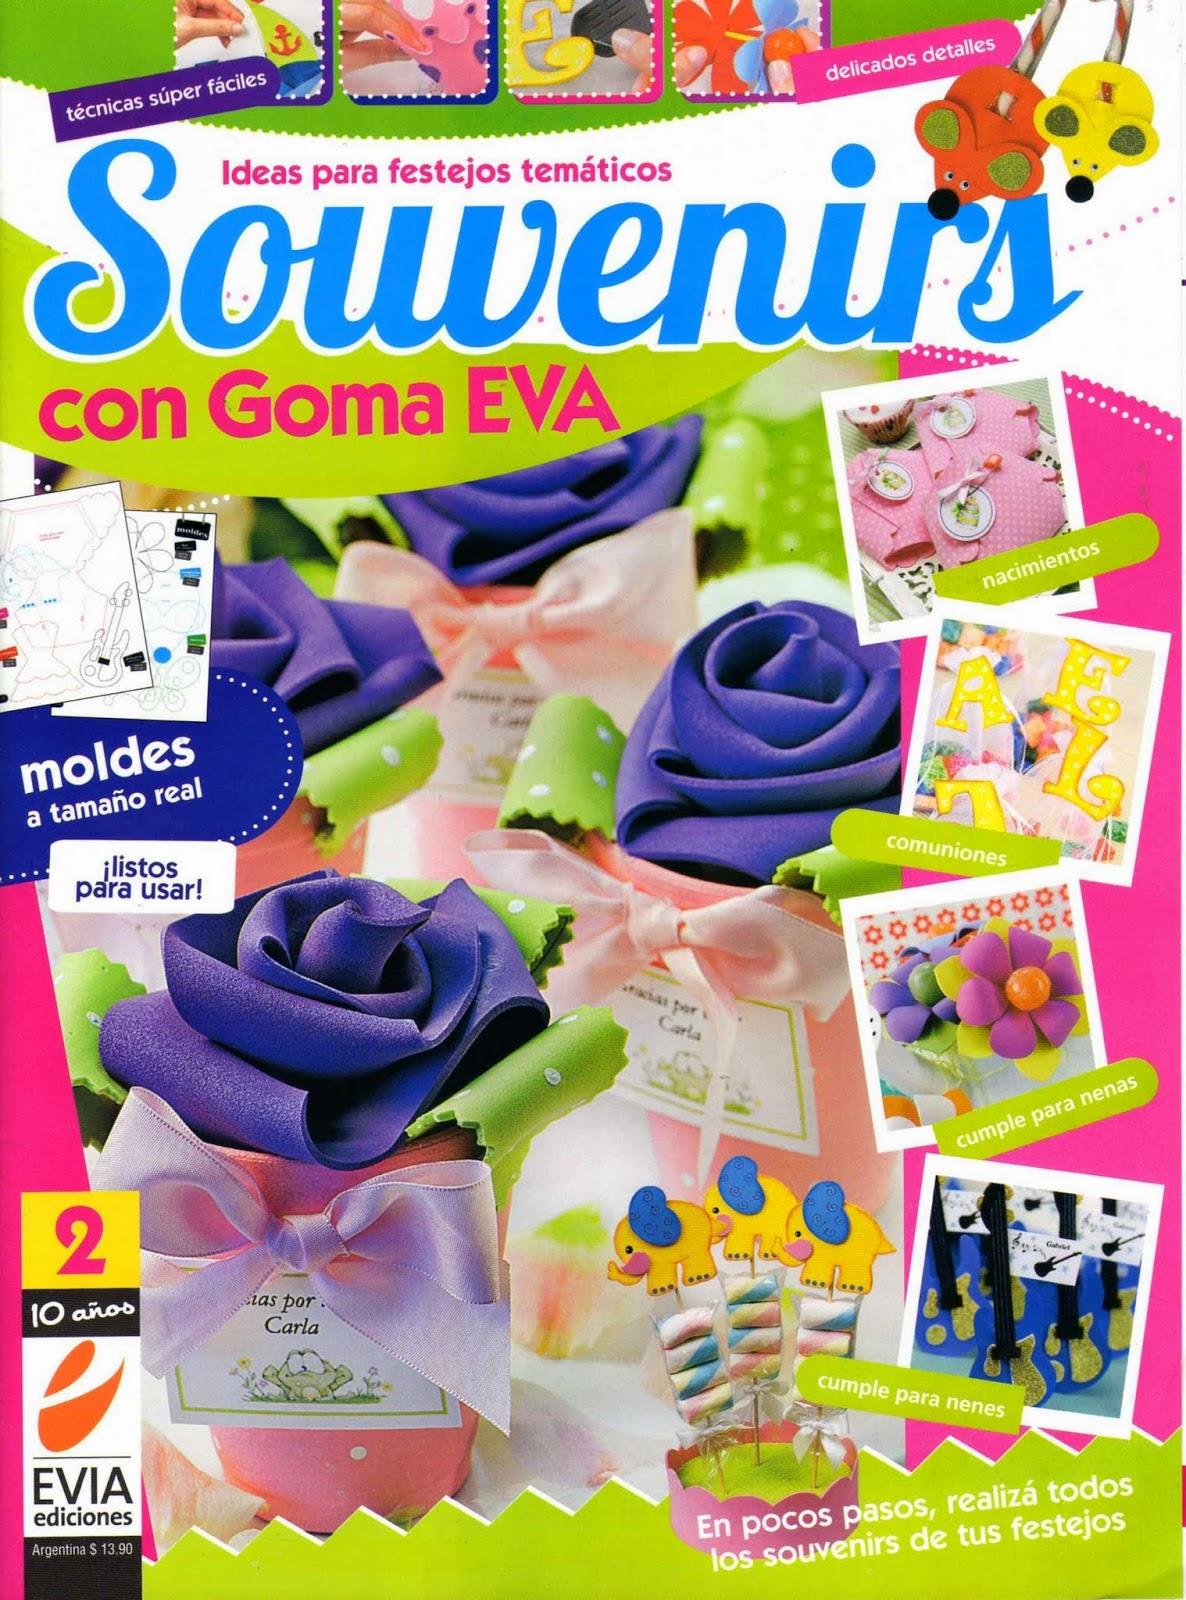 Souvenirs con goma eva paso a paso revistas de for Decoracion del hogar pdf